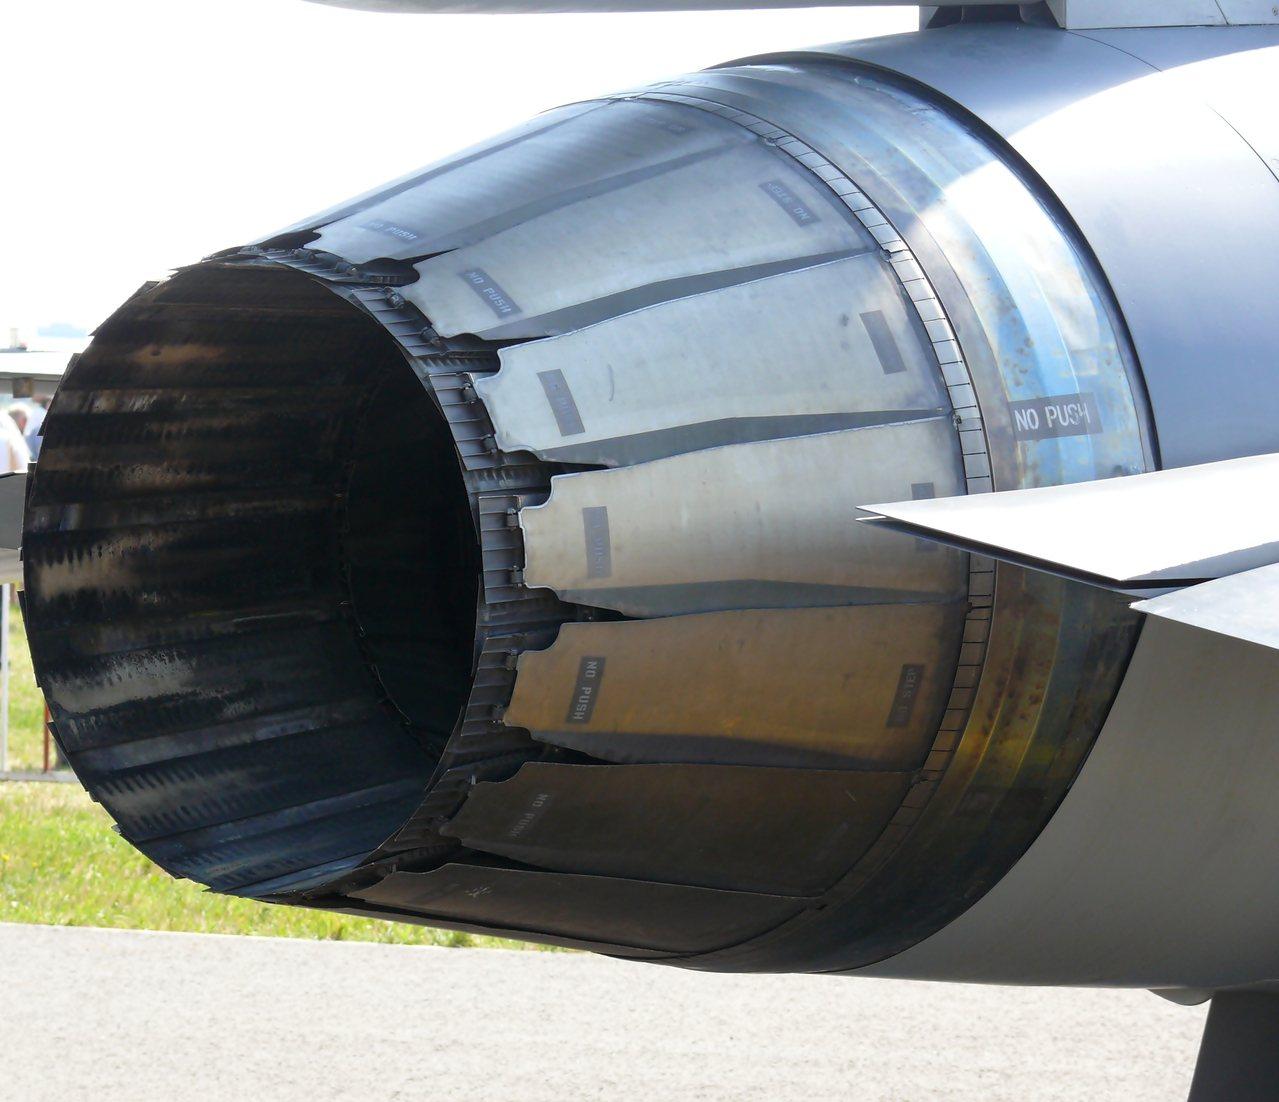 F100發動機的噴嘴較細長,噴嘴的葉片是直的。圖/維基百科